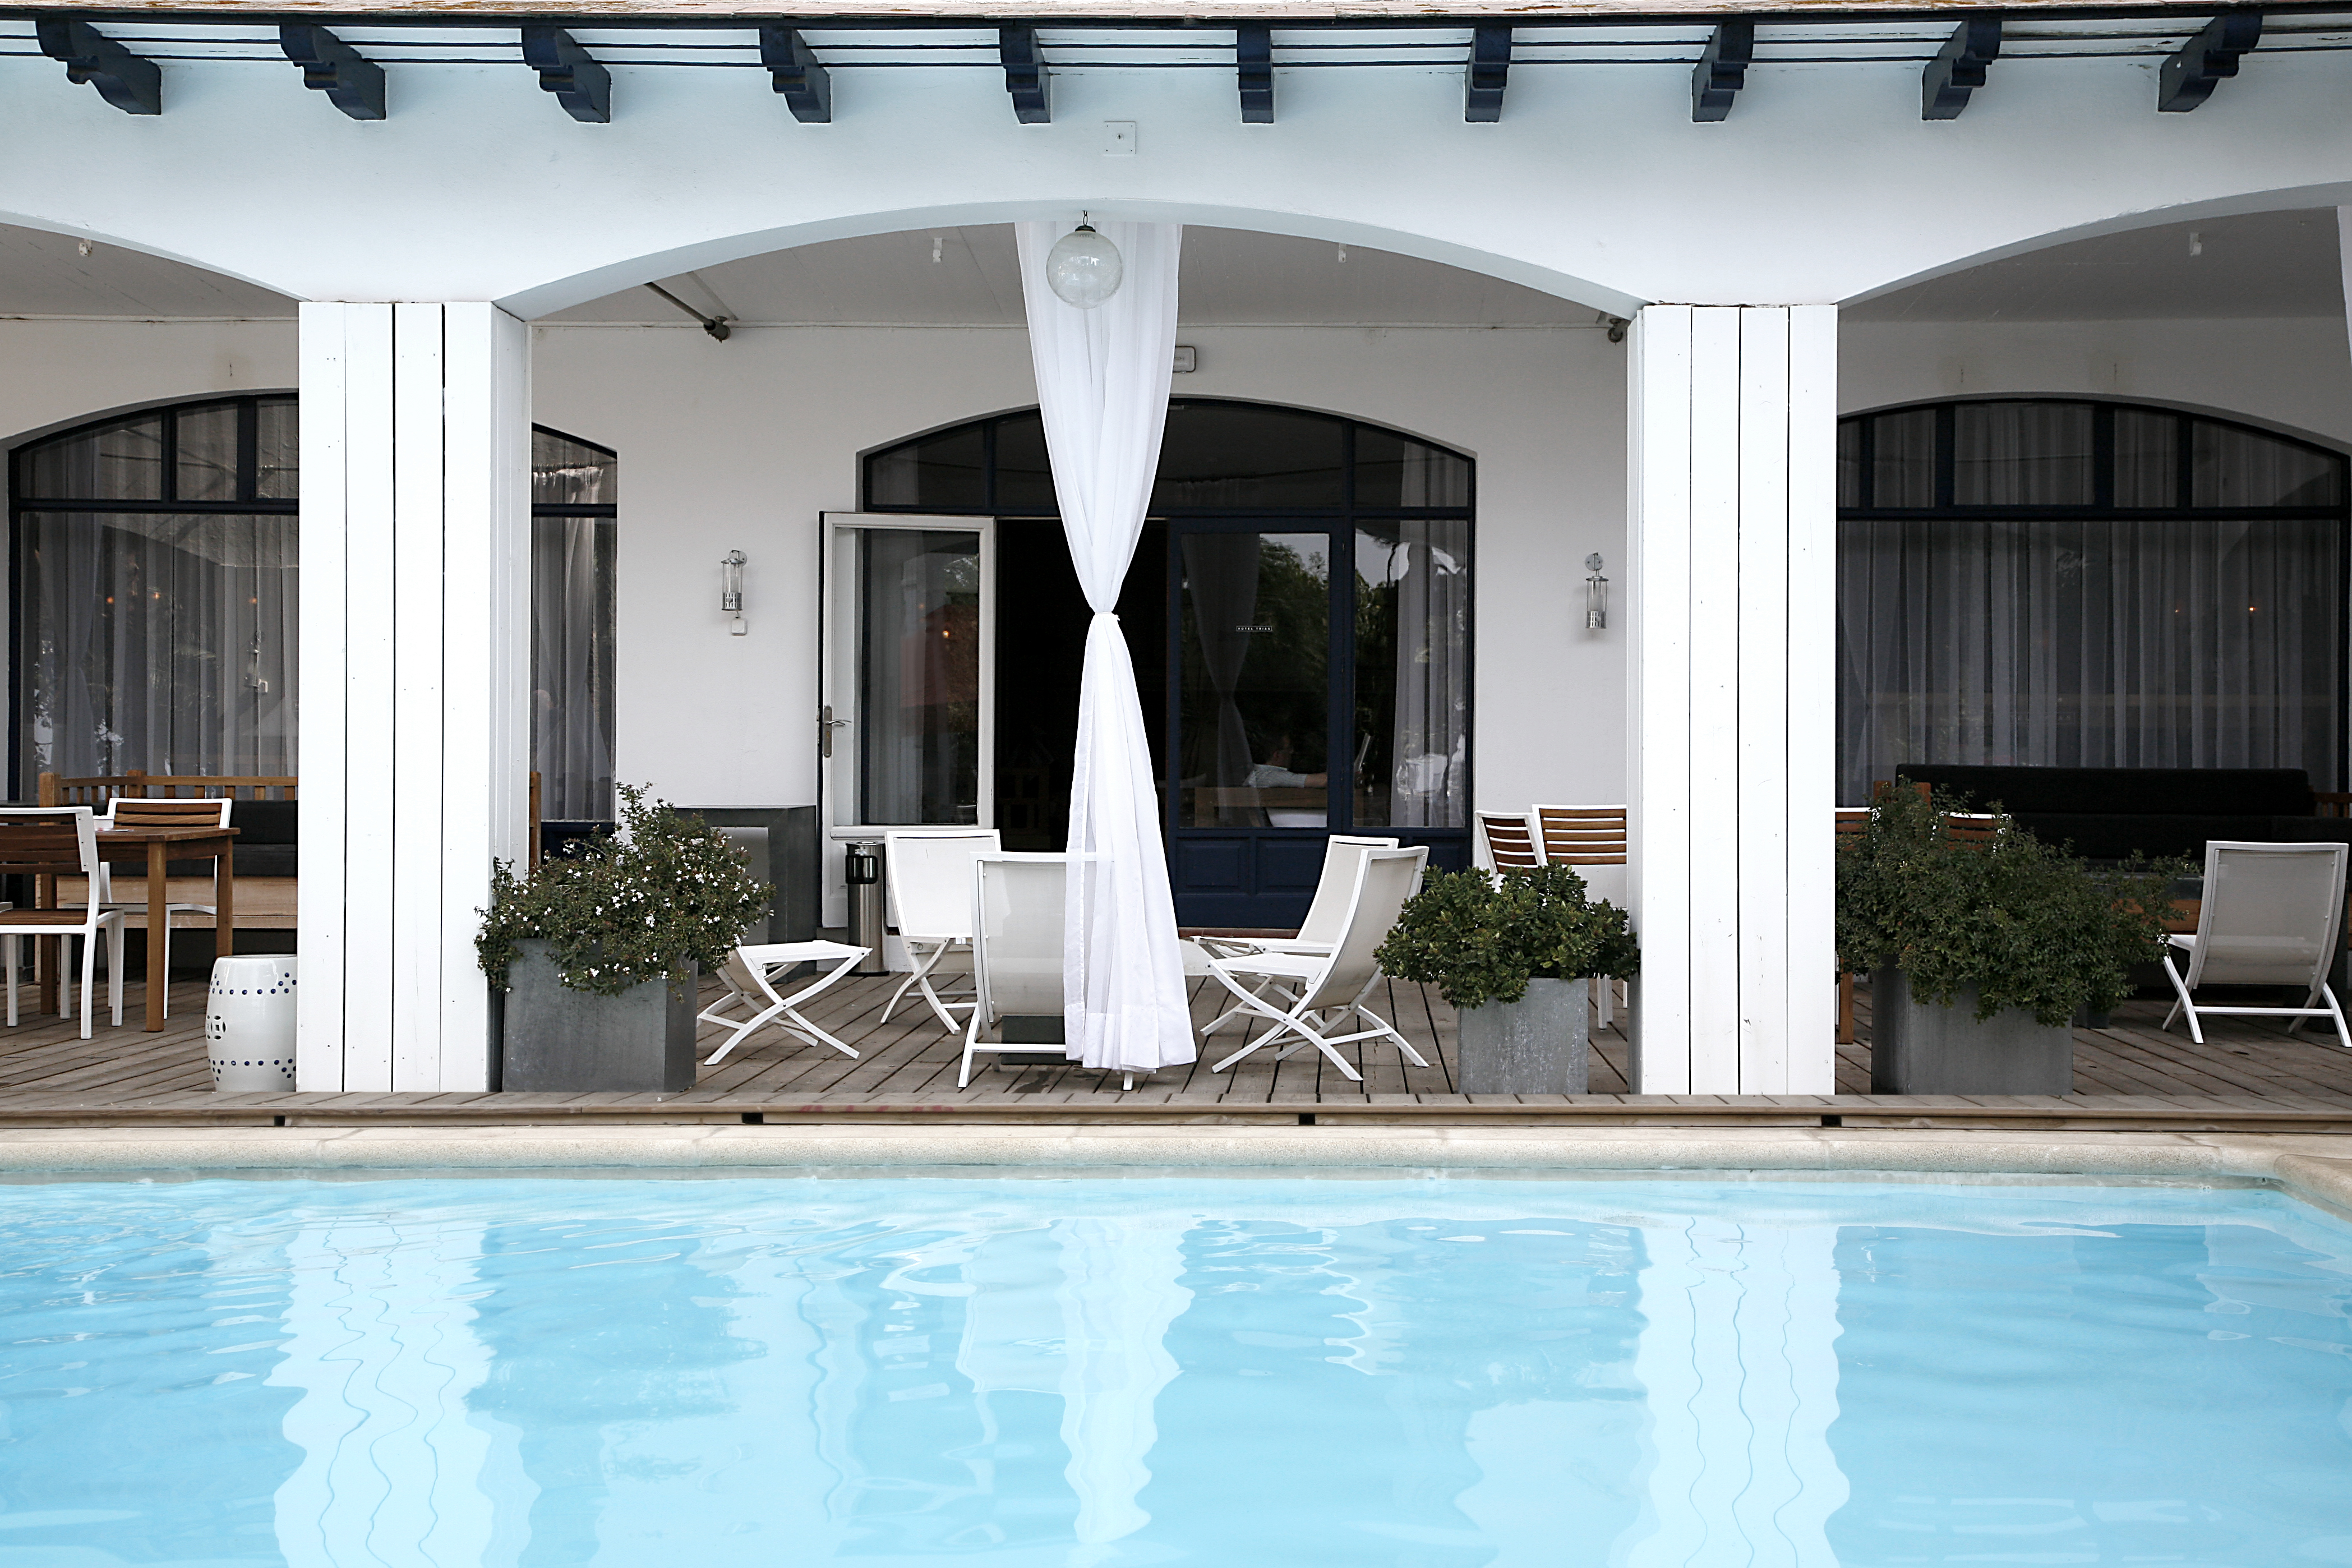 Hotel Trias Palamós